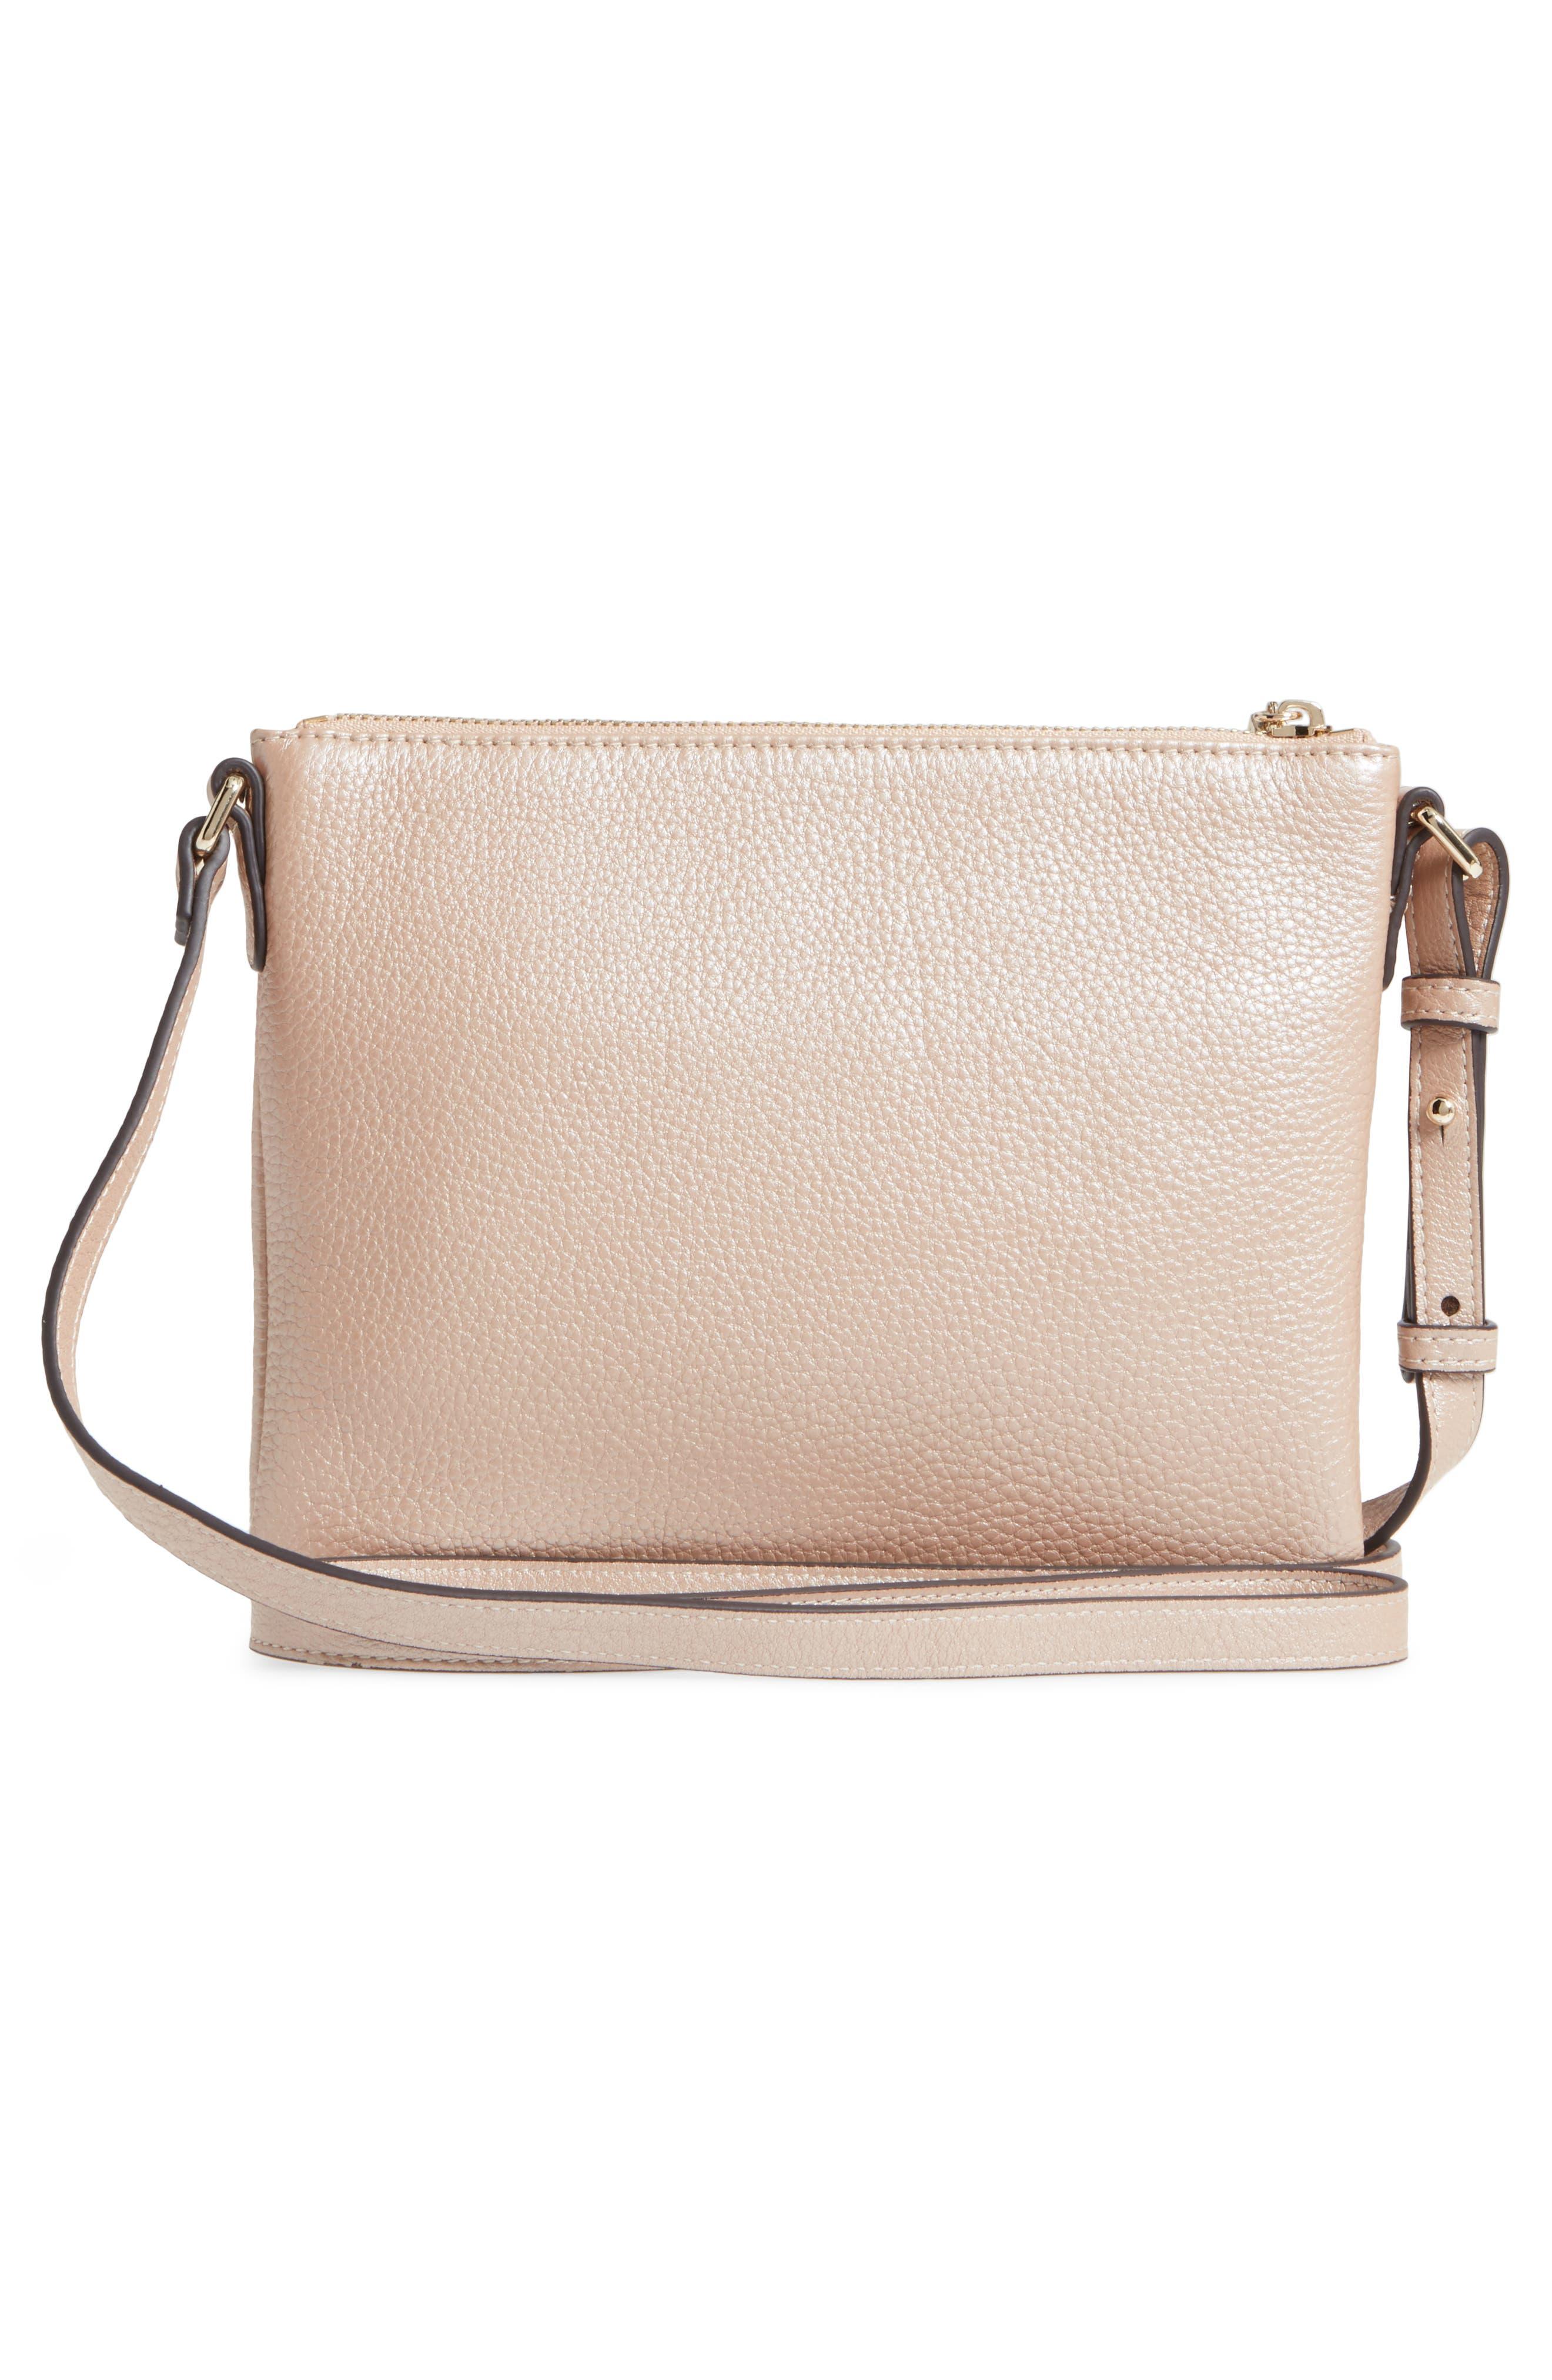 Céline Dion Adagio Leather Crossbody Bag,                             Alternate thumbnail 3, color,                             Rose Gold